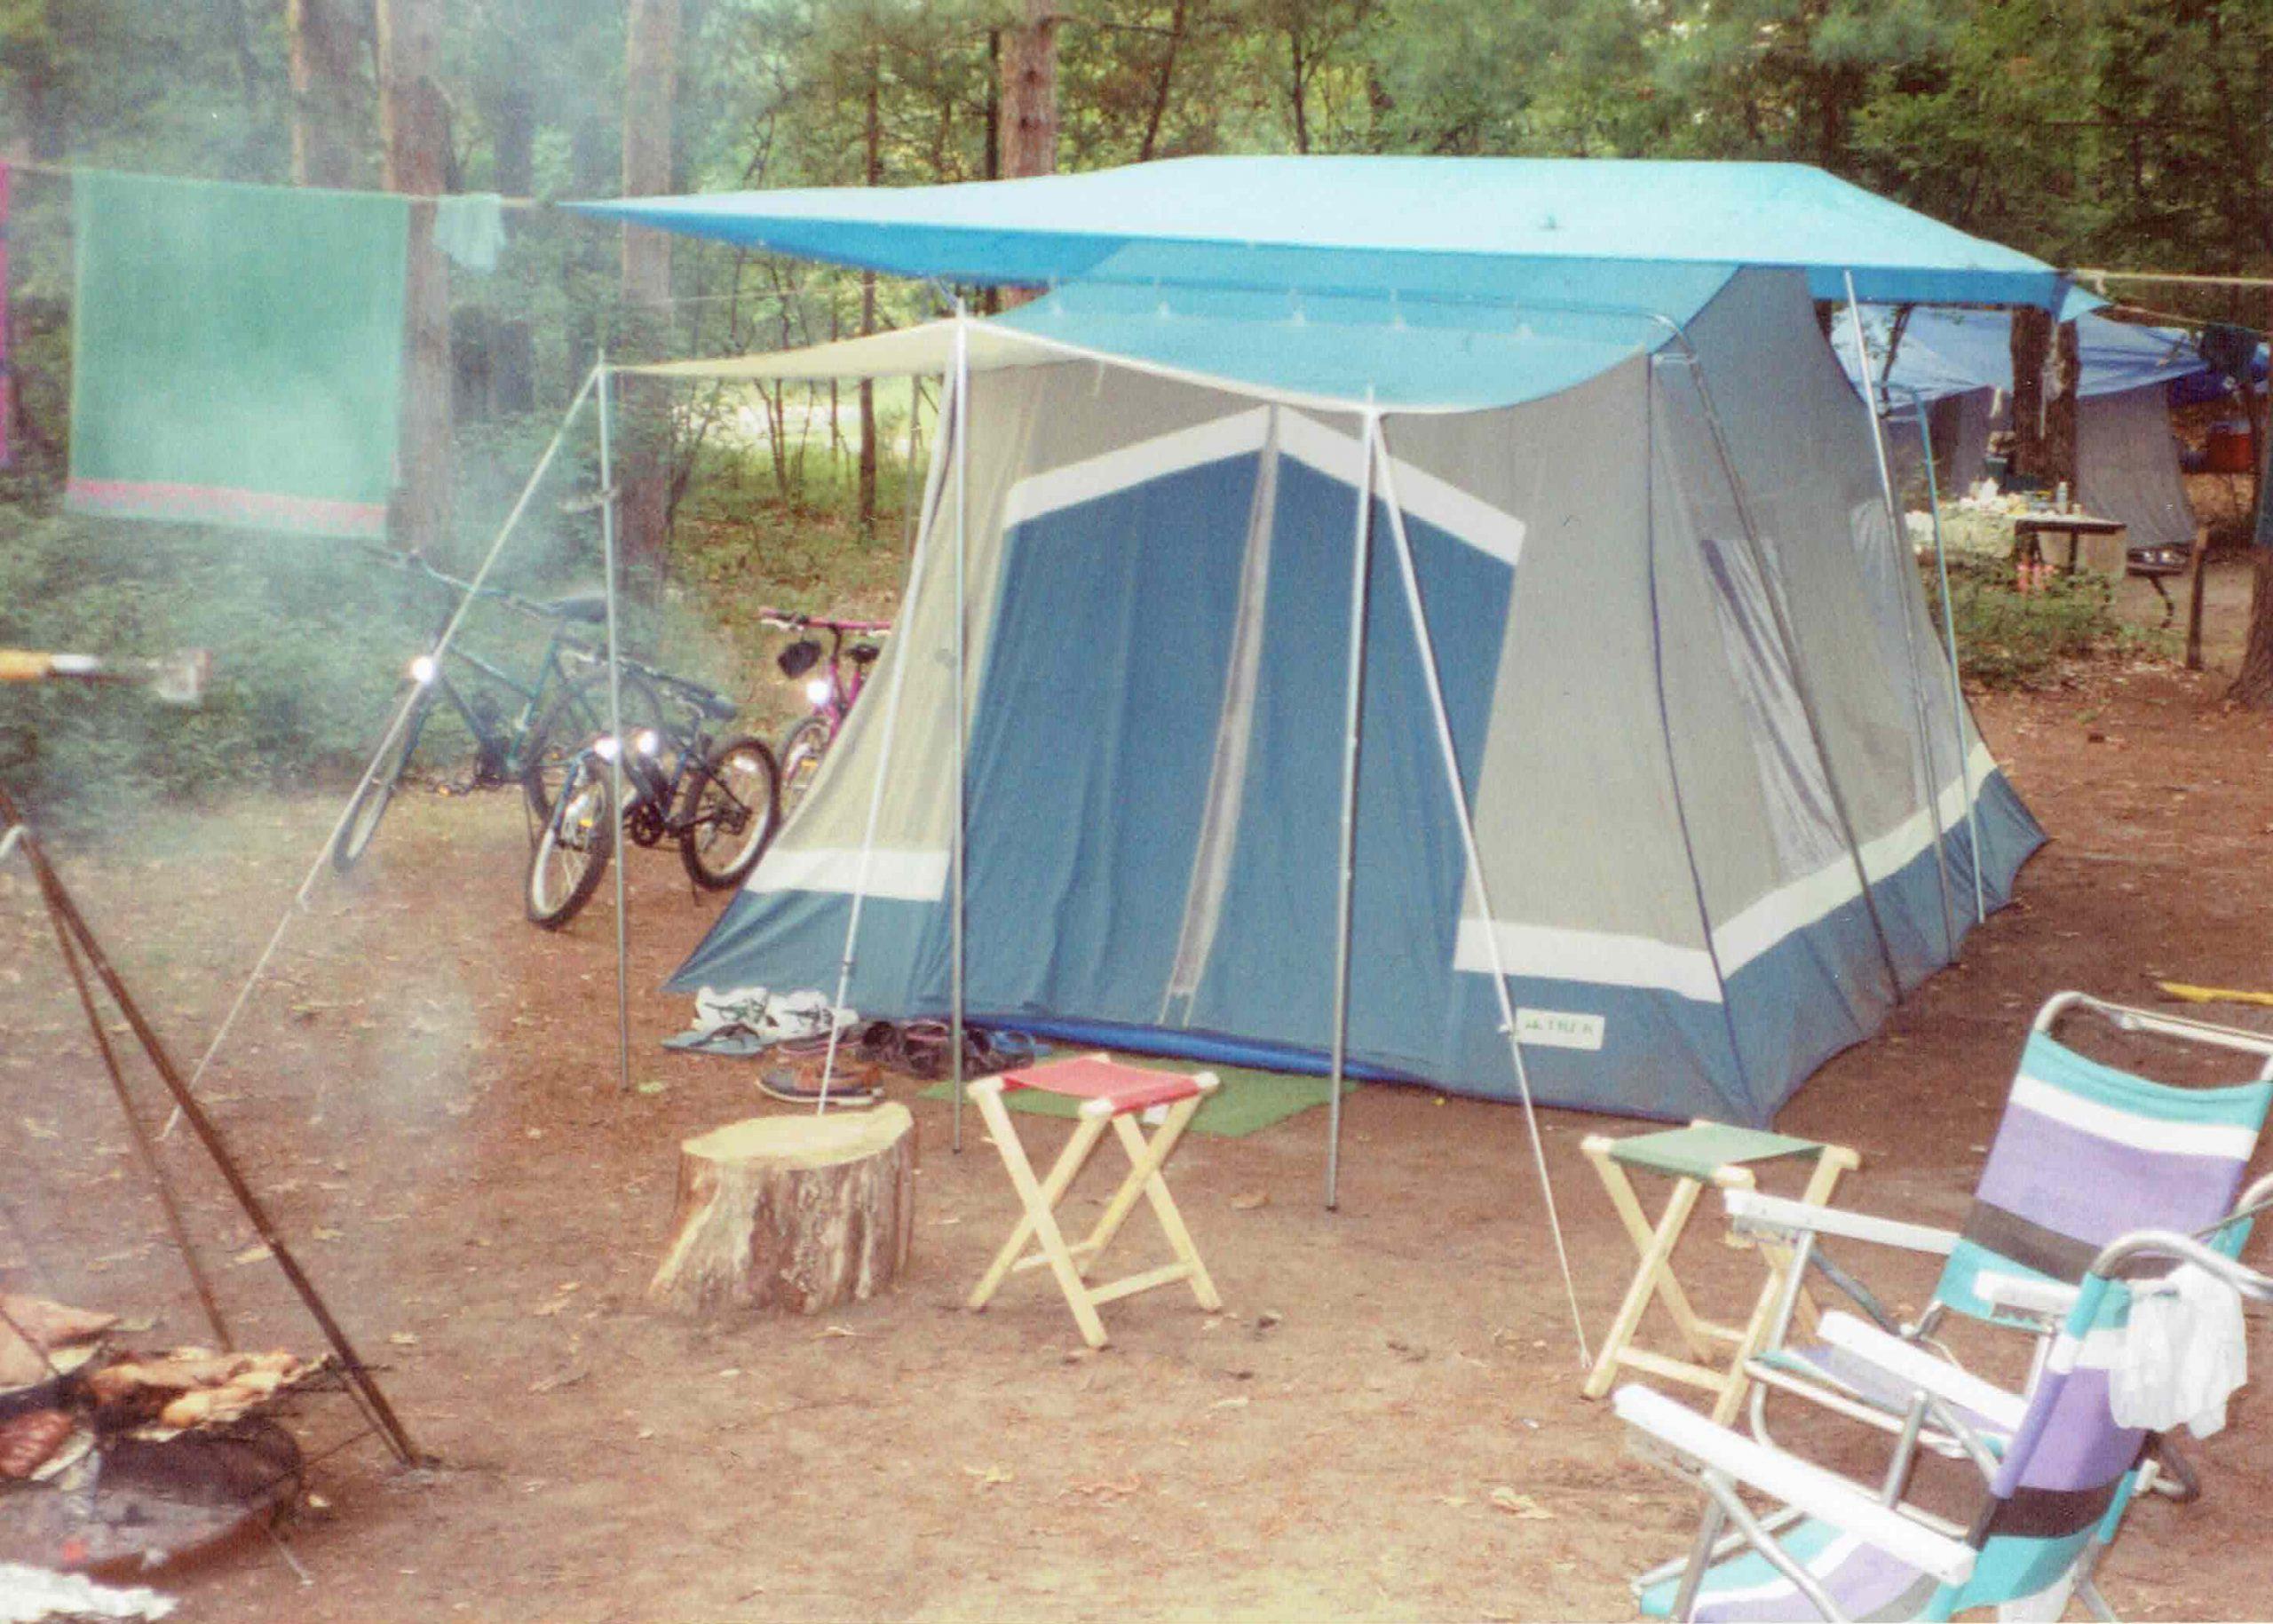 growing up camping